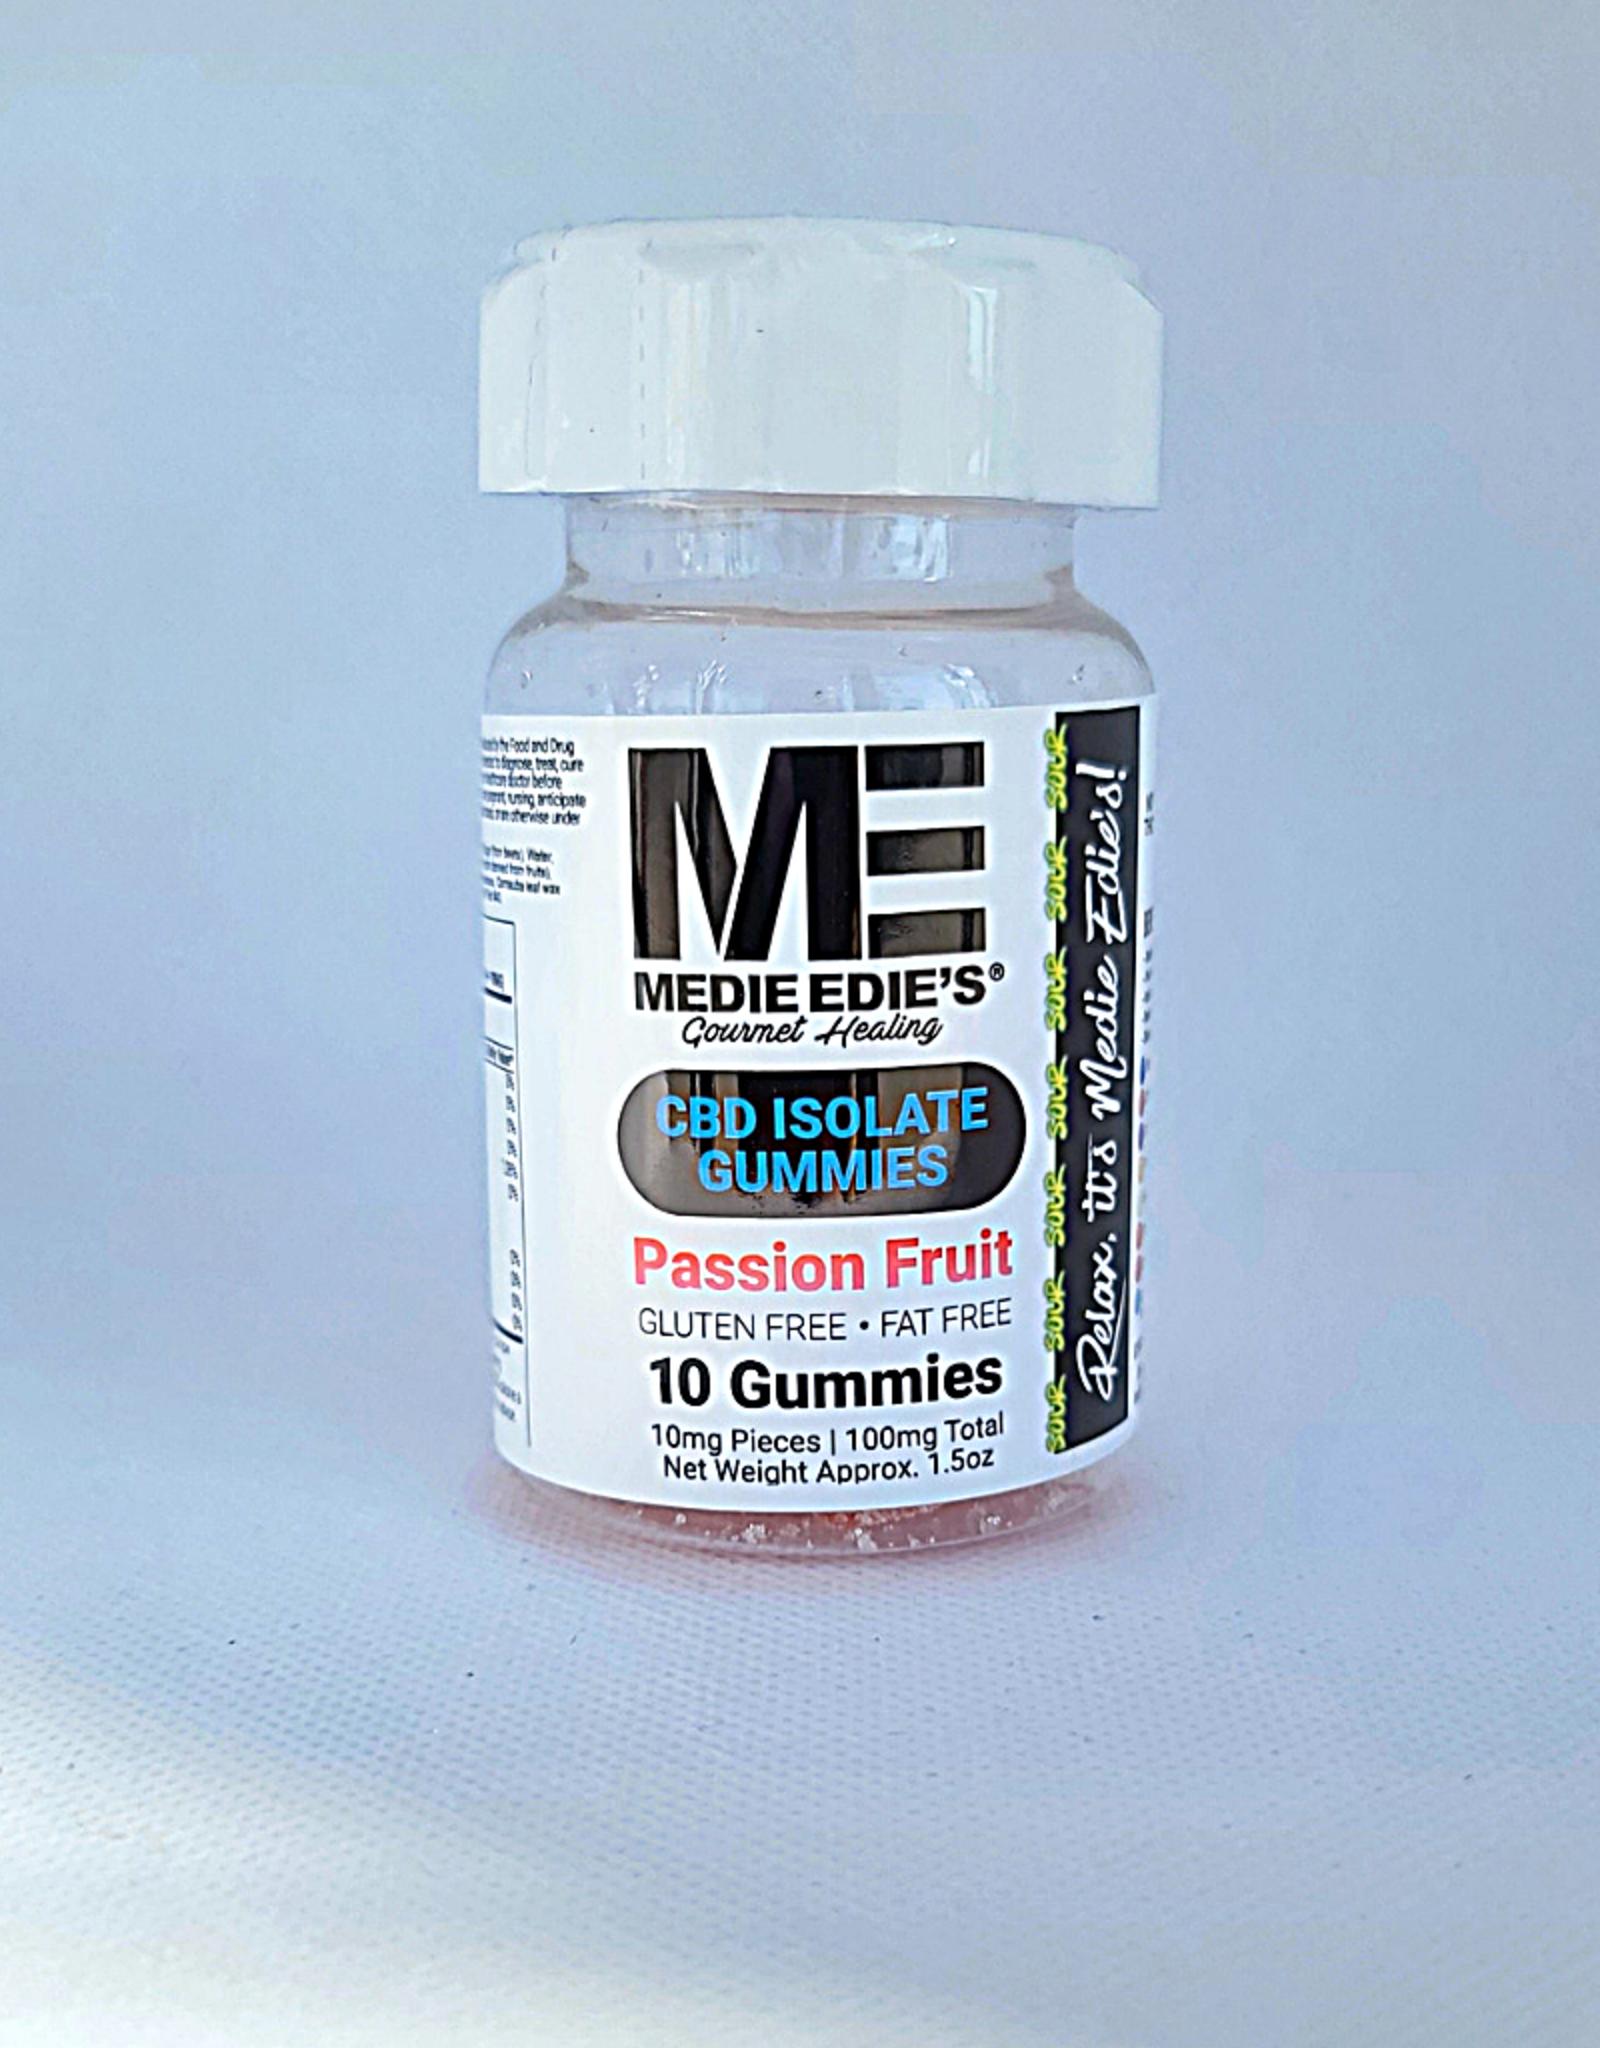 Medie Edie's Sour Passion Fruit CBD Gummies - 10ct/10mg/100mg